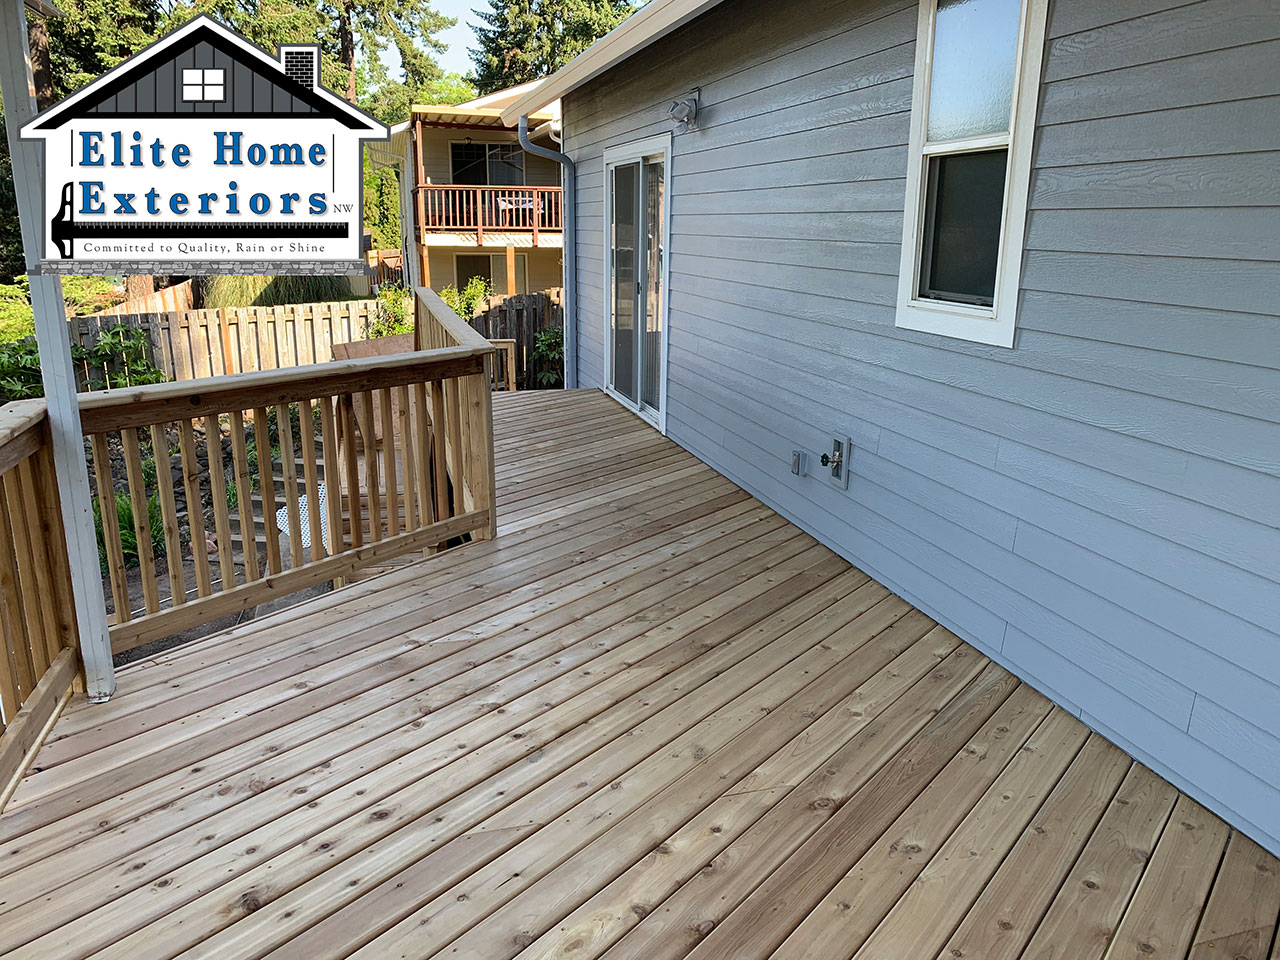 Cedar Deck Replacement James Hardieplank Fiber Cement Milwaukie Or